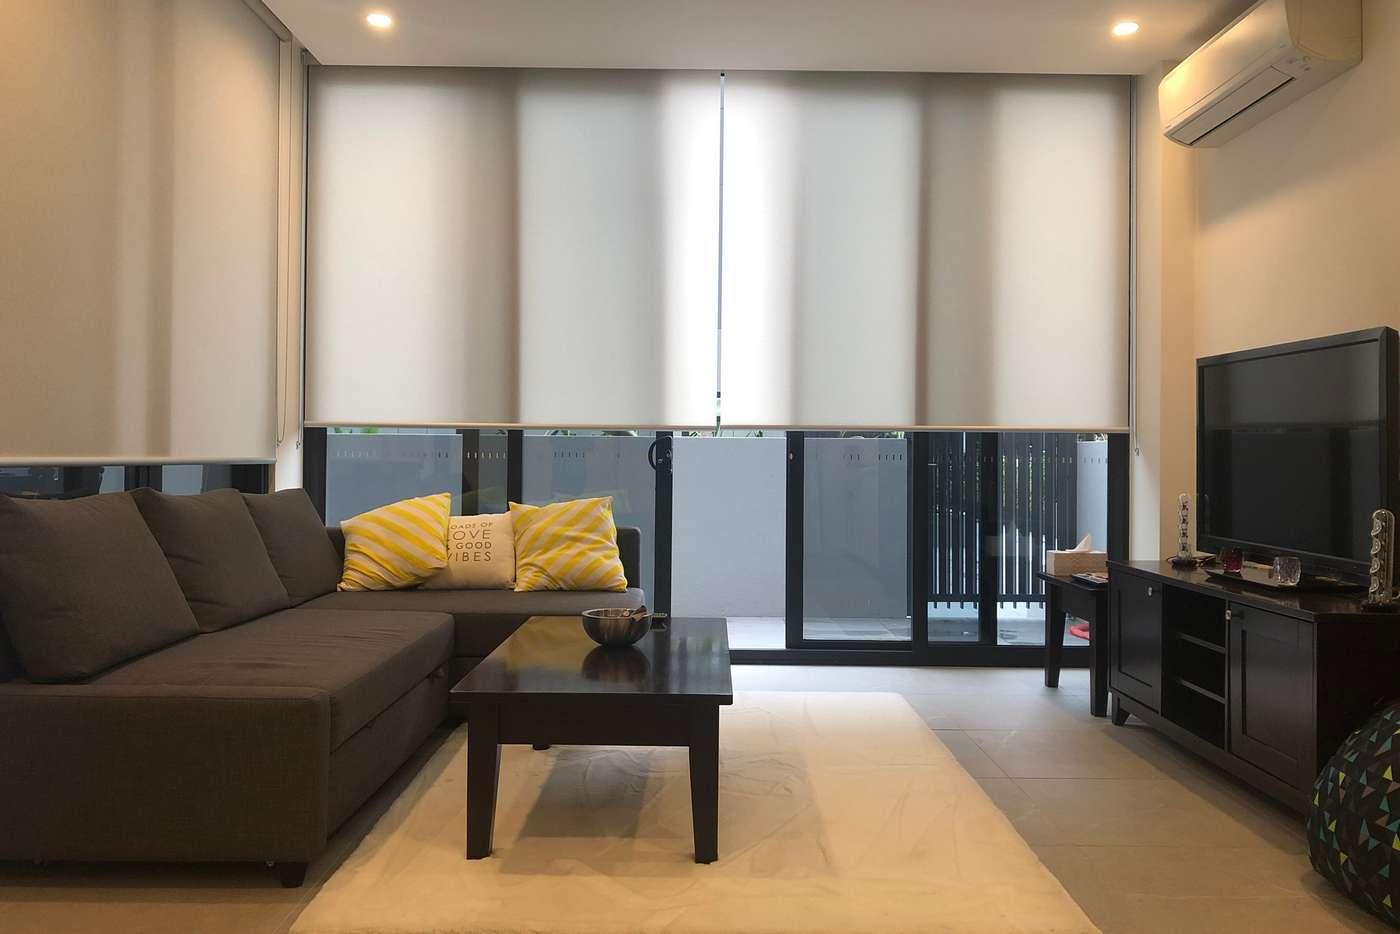 Main view of Homely apartment listing, 625/2K Morton Street, Parramatta NSW 2150